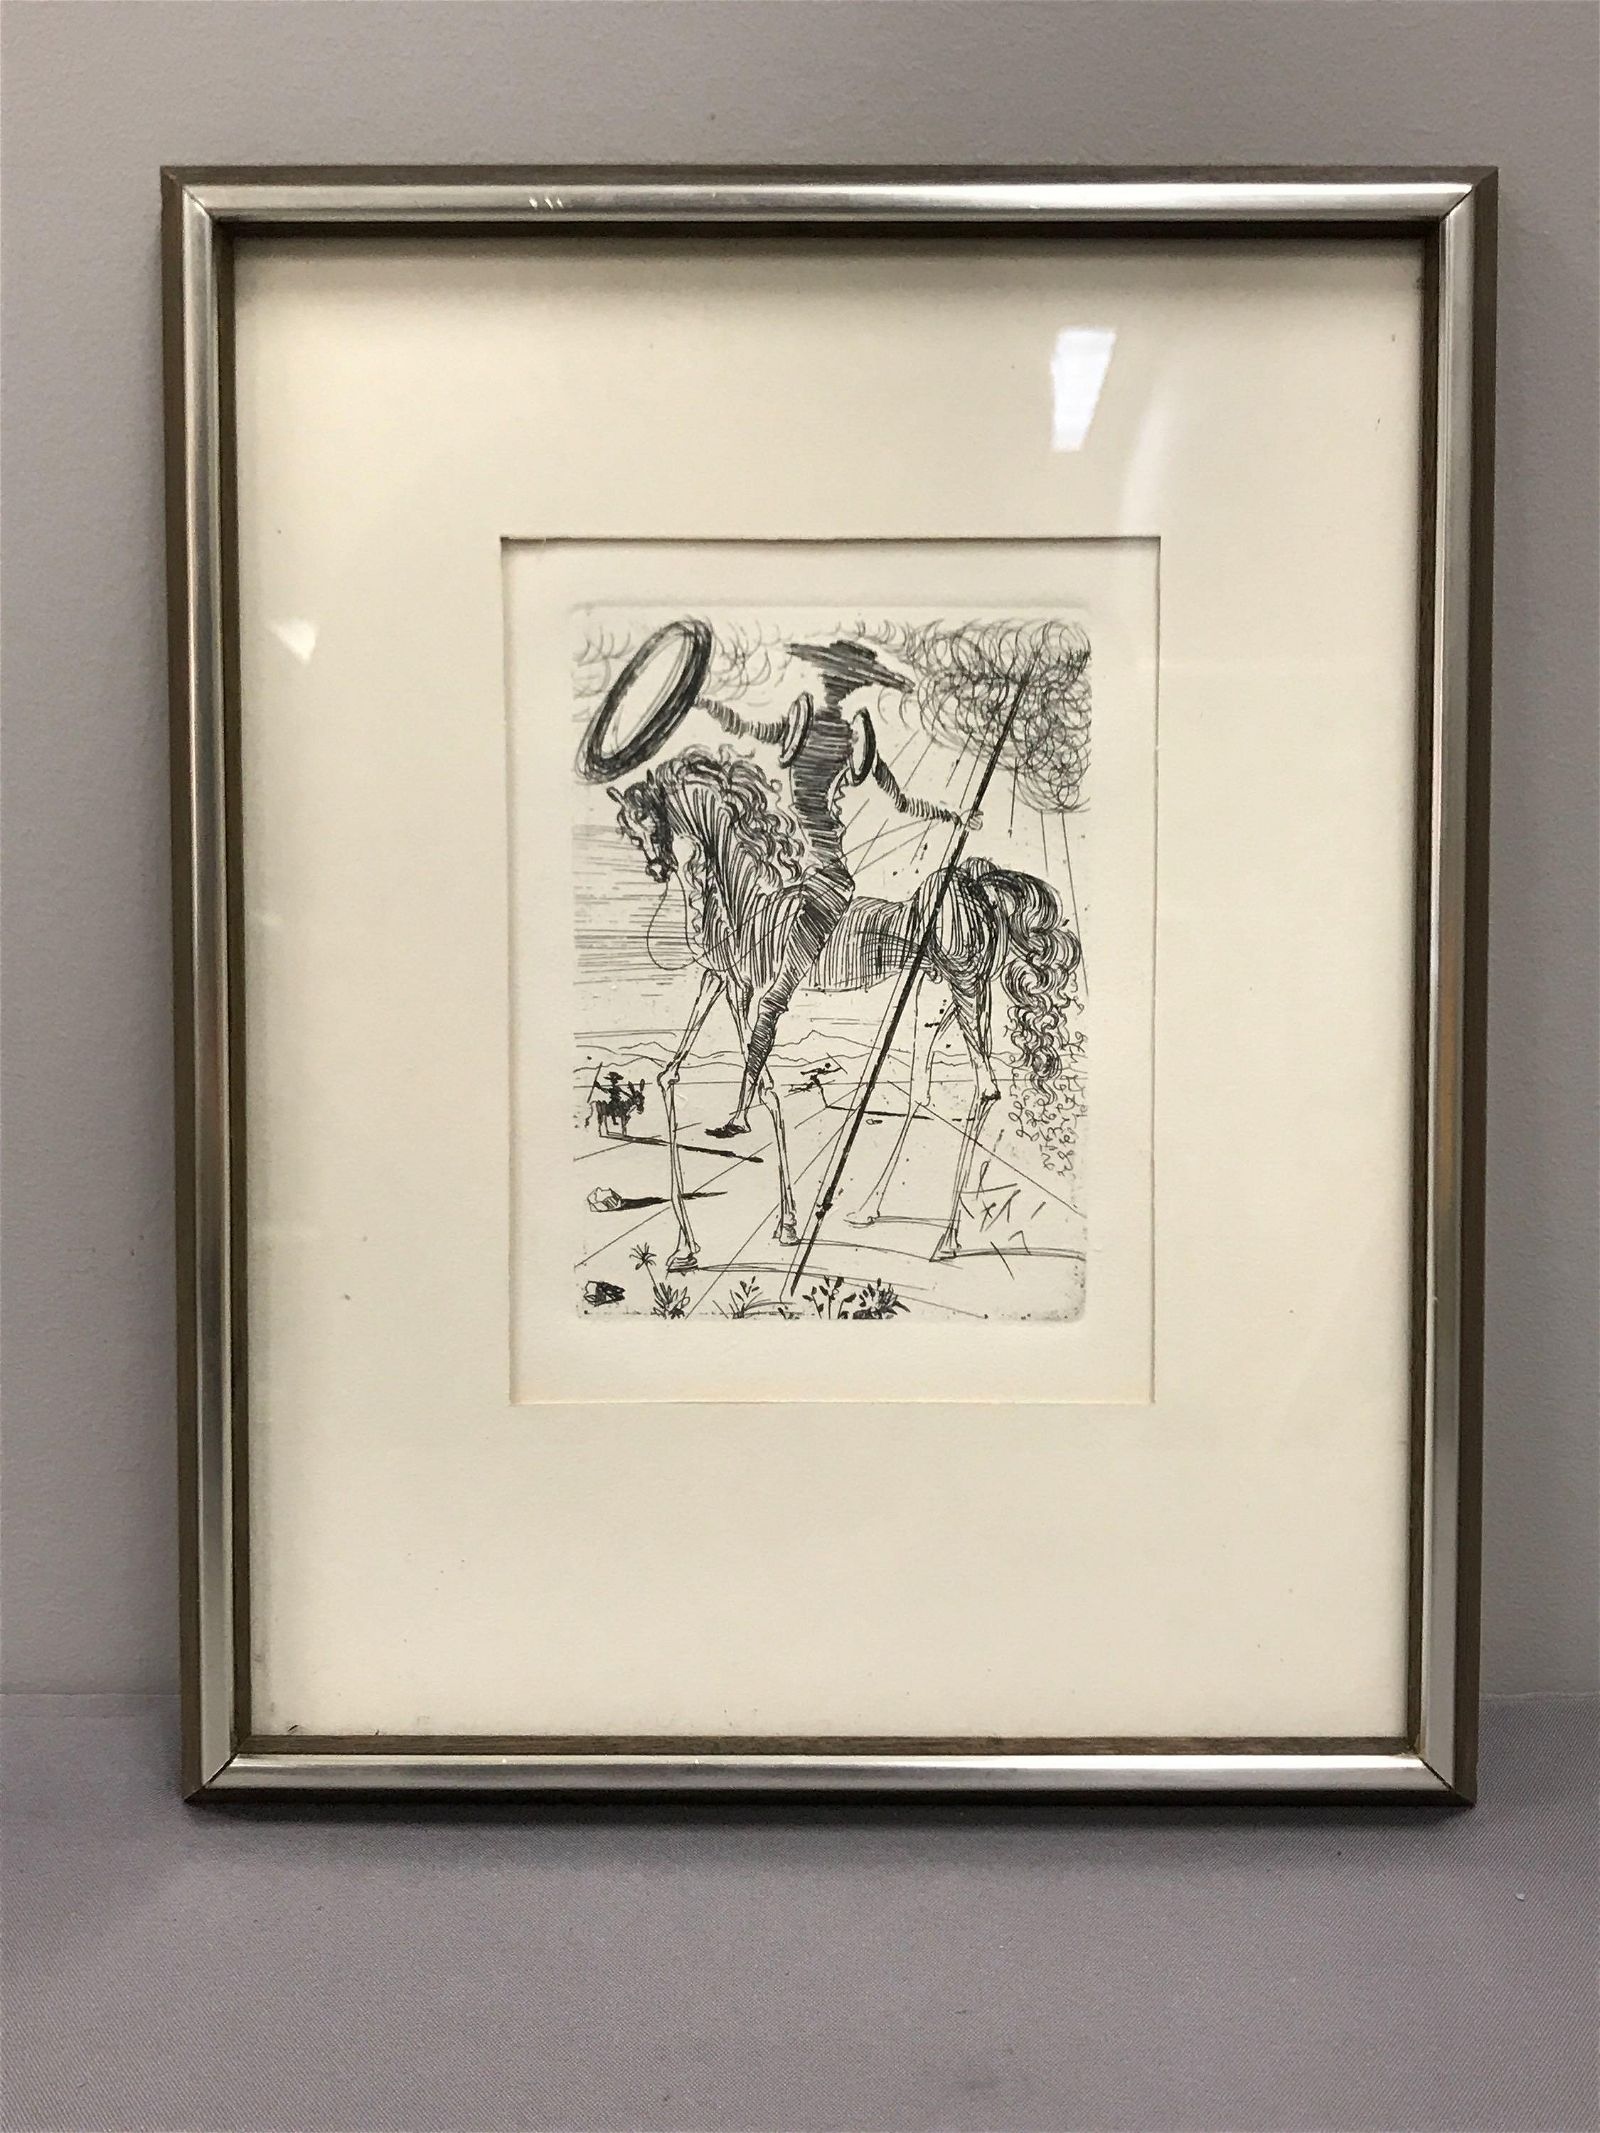 Framed artwork etching Salvador Dali Don Quixote